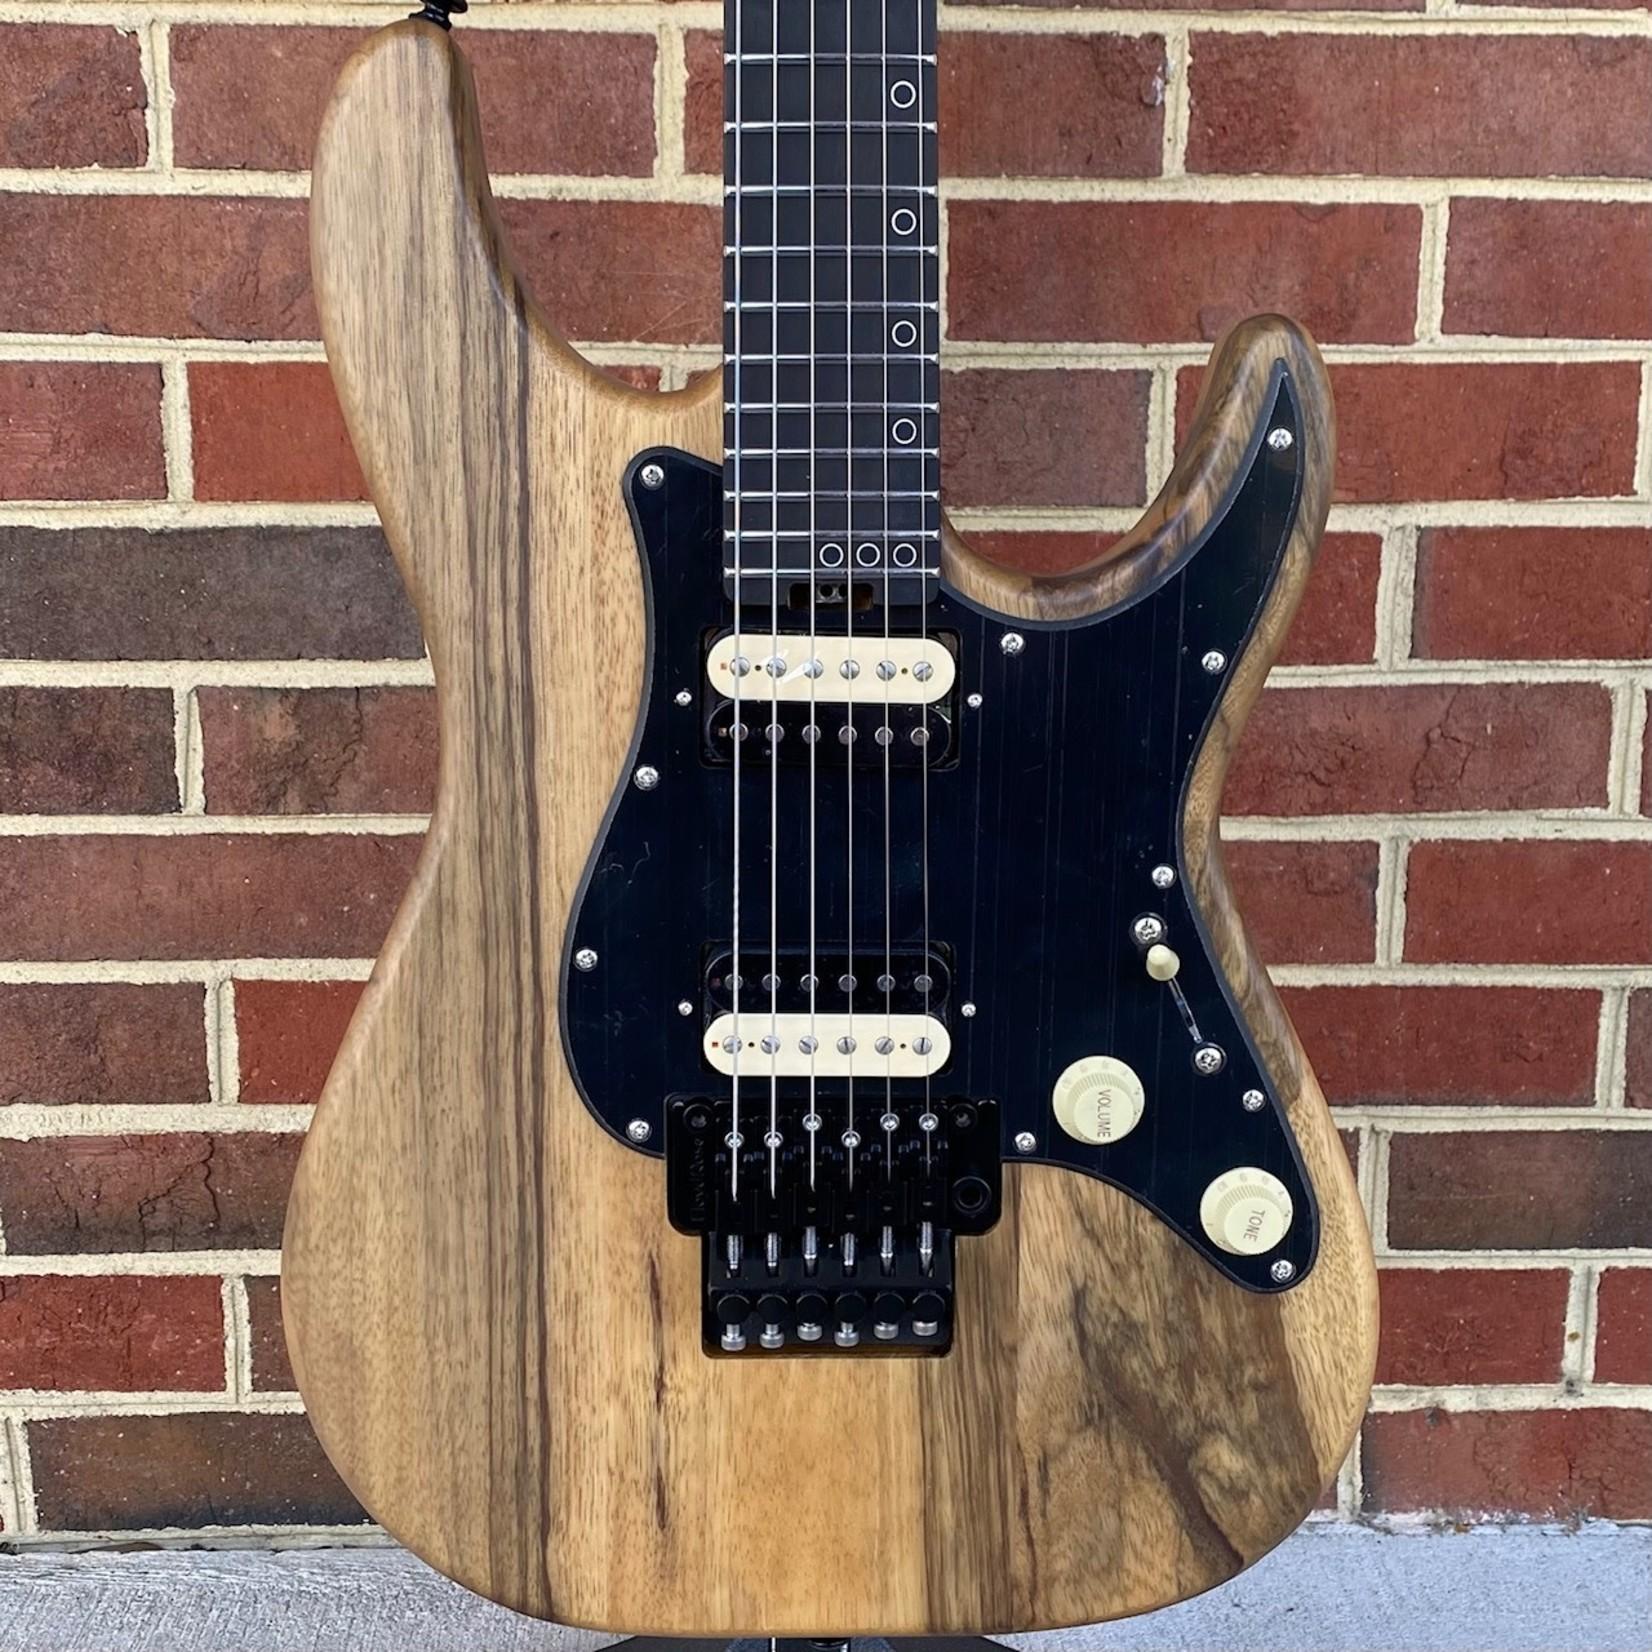 Schecter Guitar Research Schecter Sun Valley Super Shredder Exotic, Black Limba Body, Wenge Neck, Ebony Fretboard, Floyd Rose